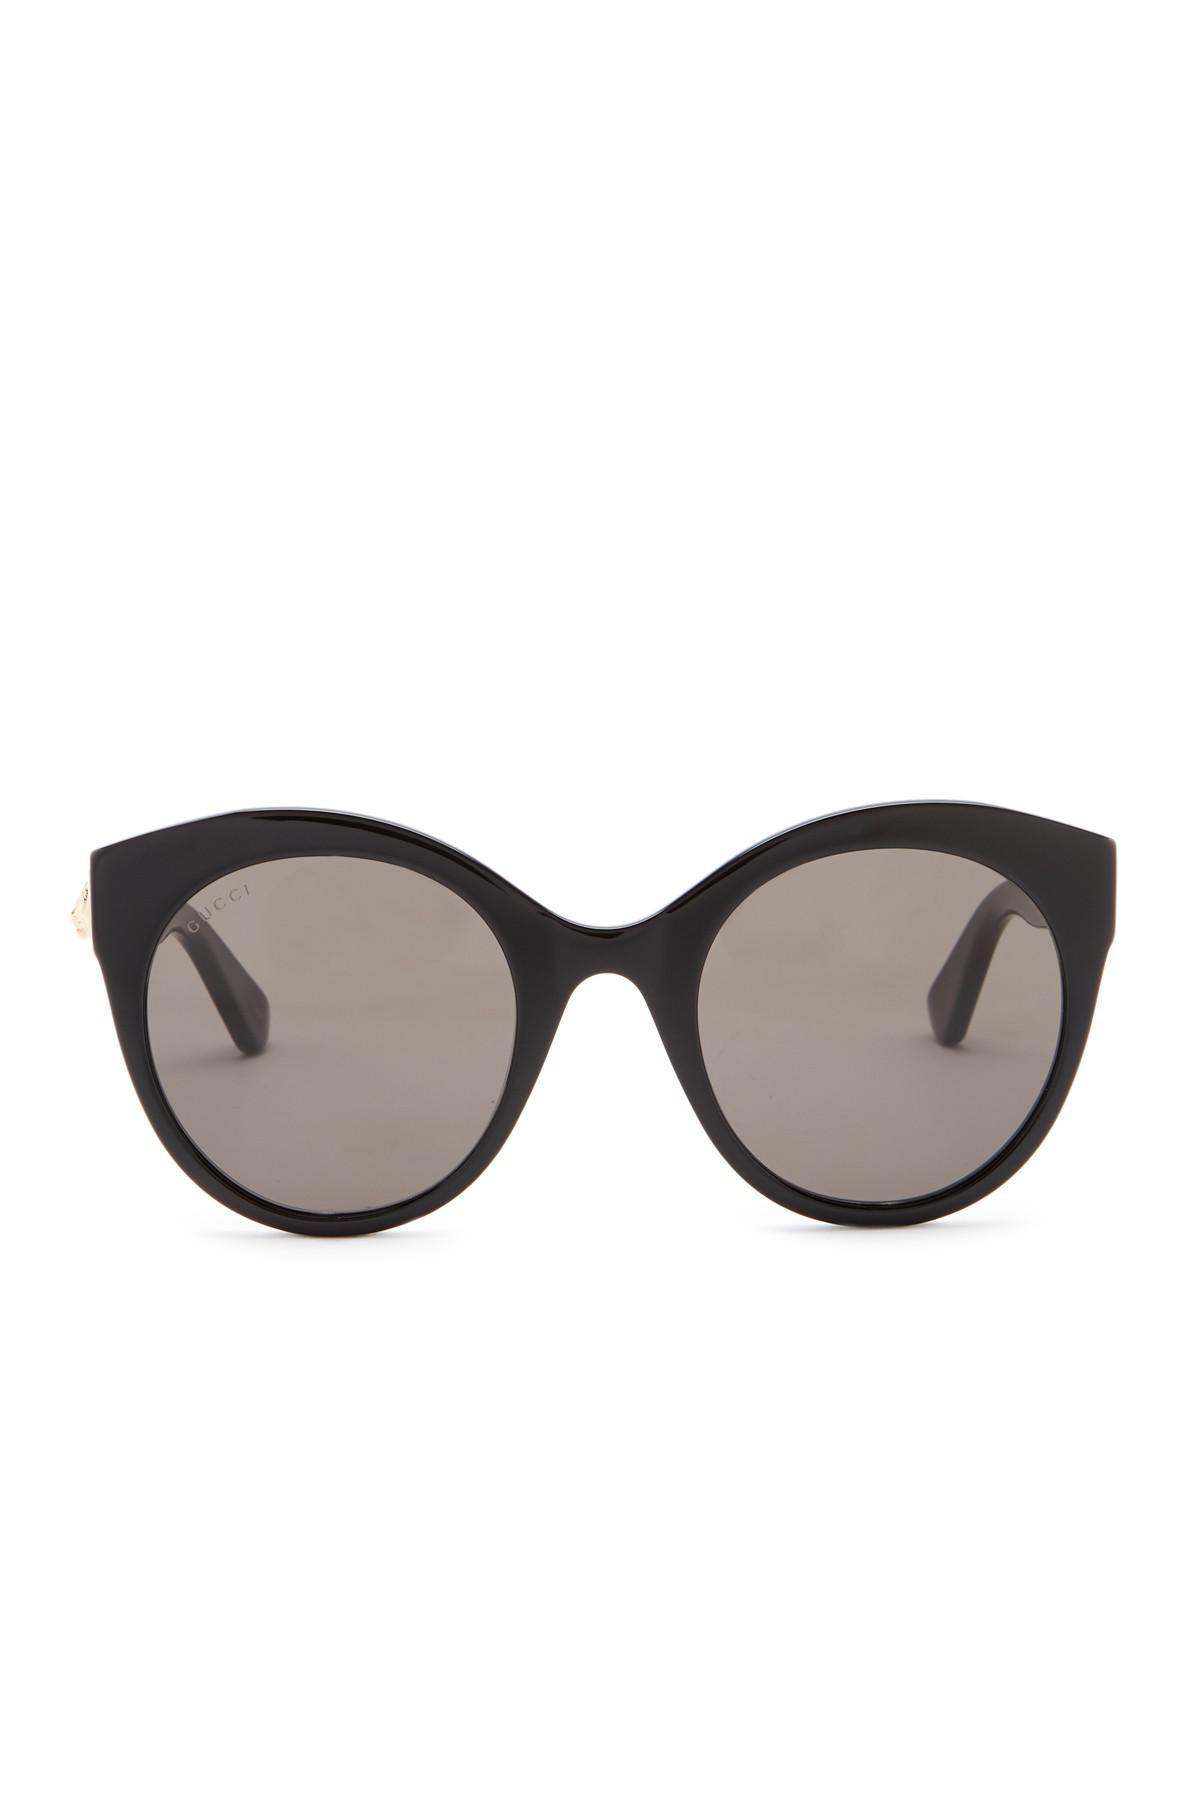 b06acf339faa Gucci Black 52mm Round Cat Eye Sunglasses. View fullscreen